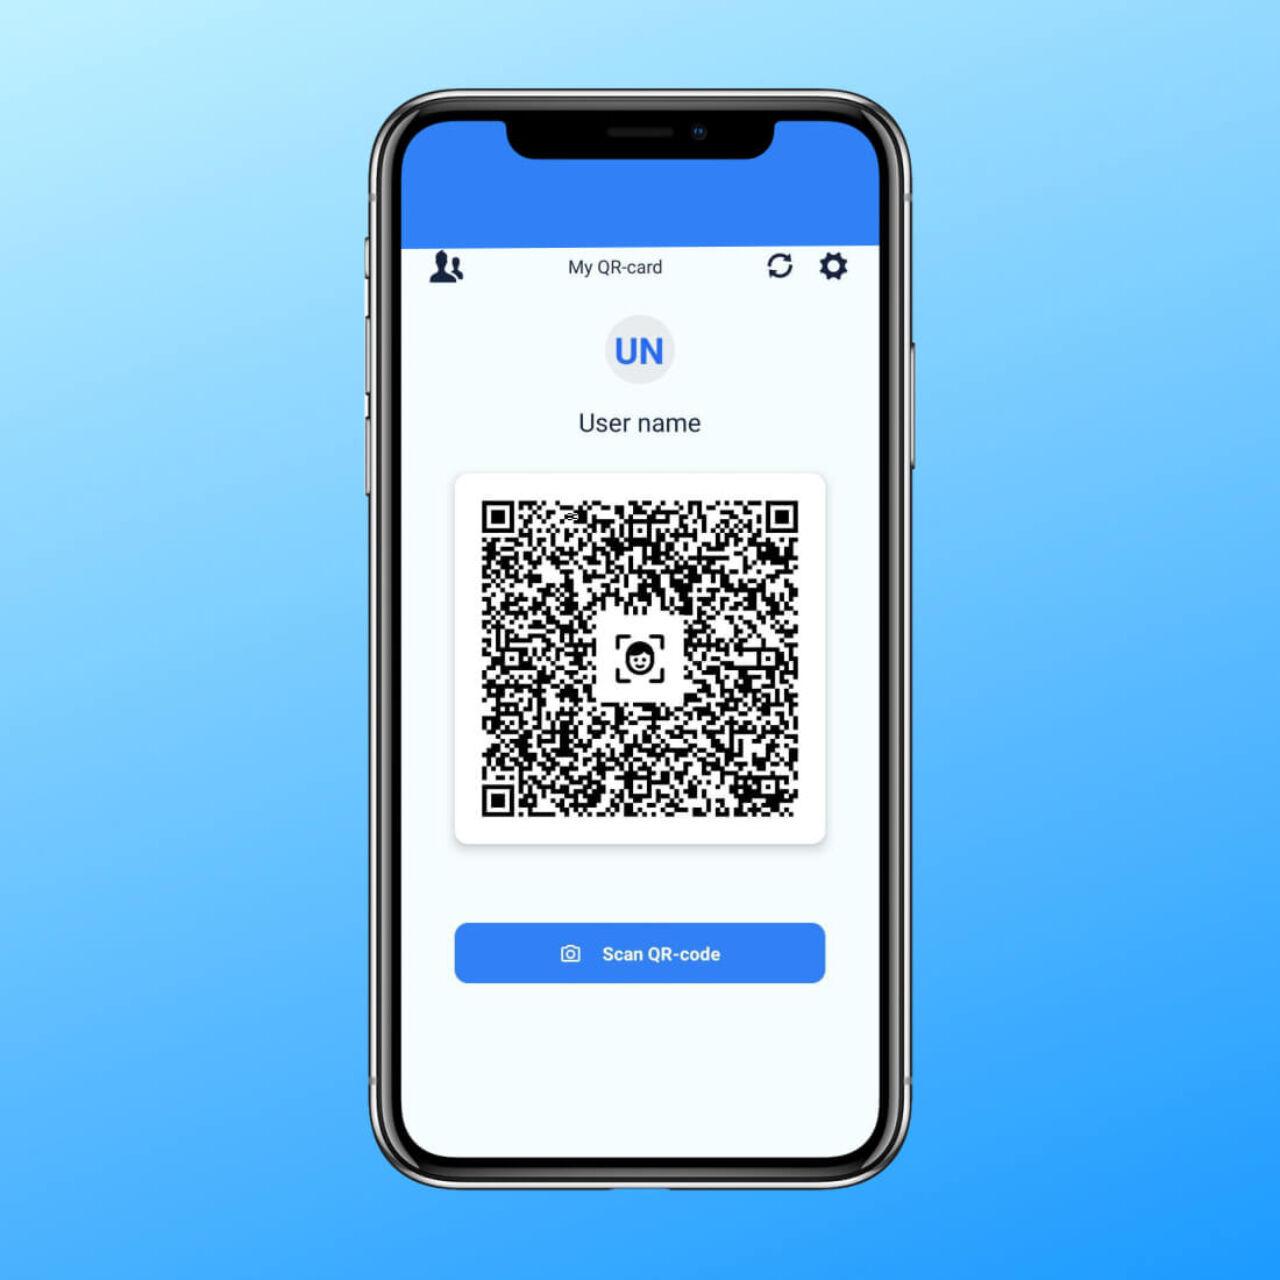 Business card scanner app - QR-code